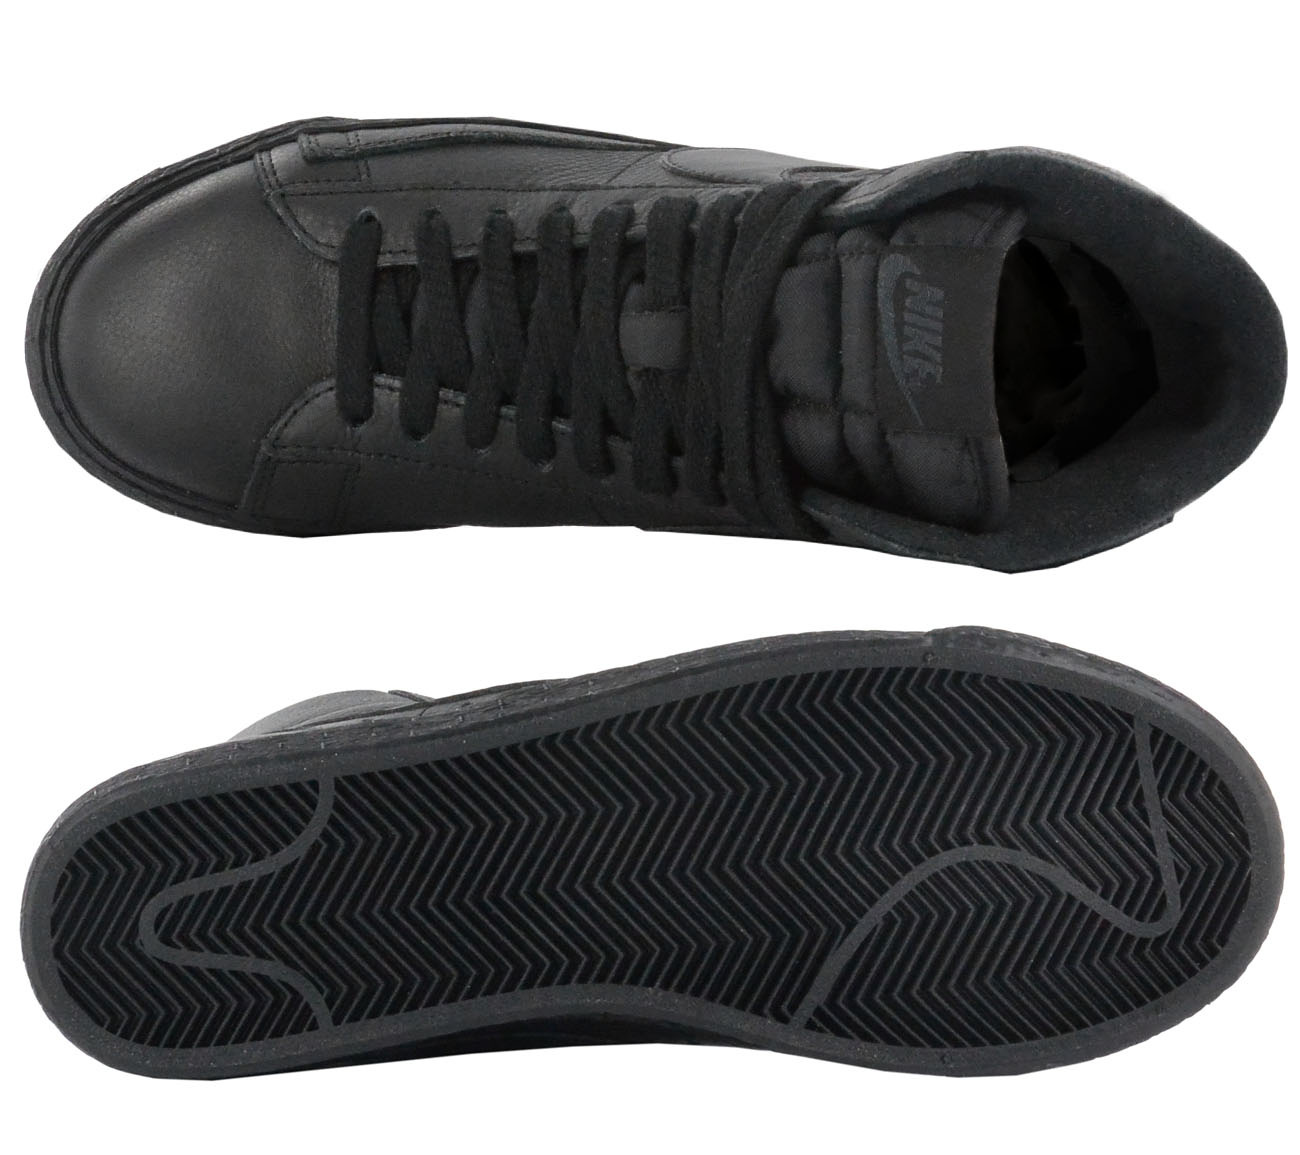 97dc56eb3f88 Details zu Nike Blazer Mid SE Sneaker Schwarz Damen Leder Schuhe Turnschuhe  NEU 885315-001